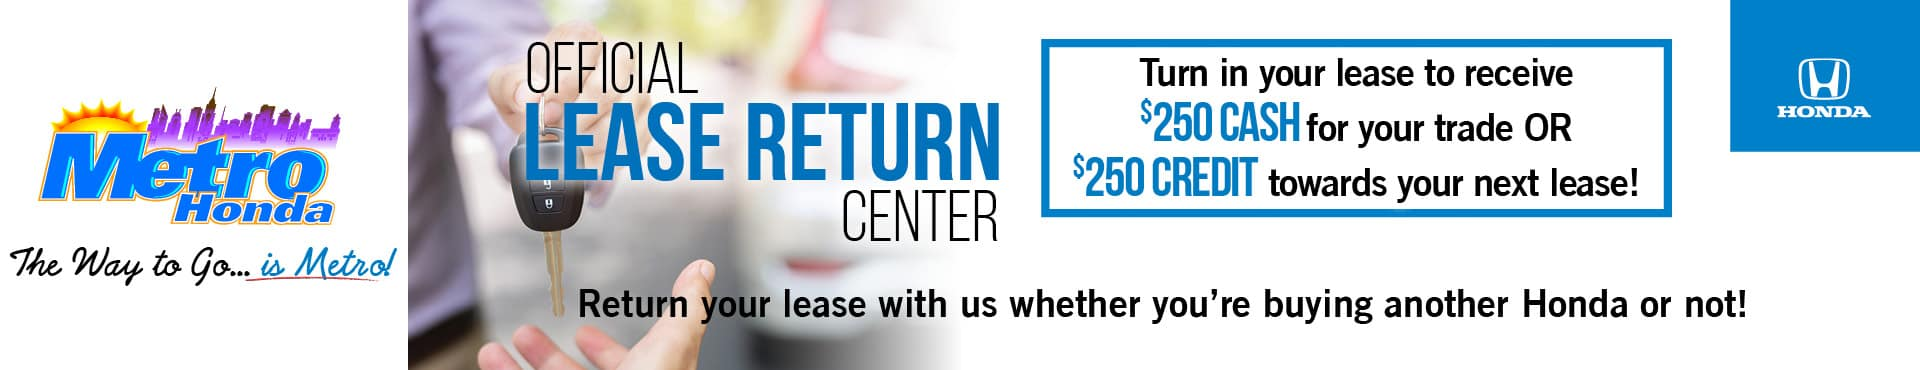 MetHon-1192 lease return banners social 5